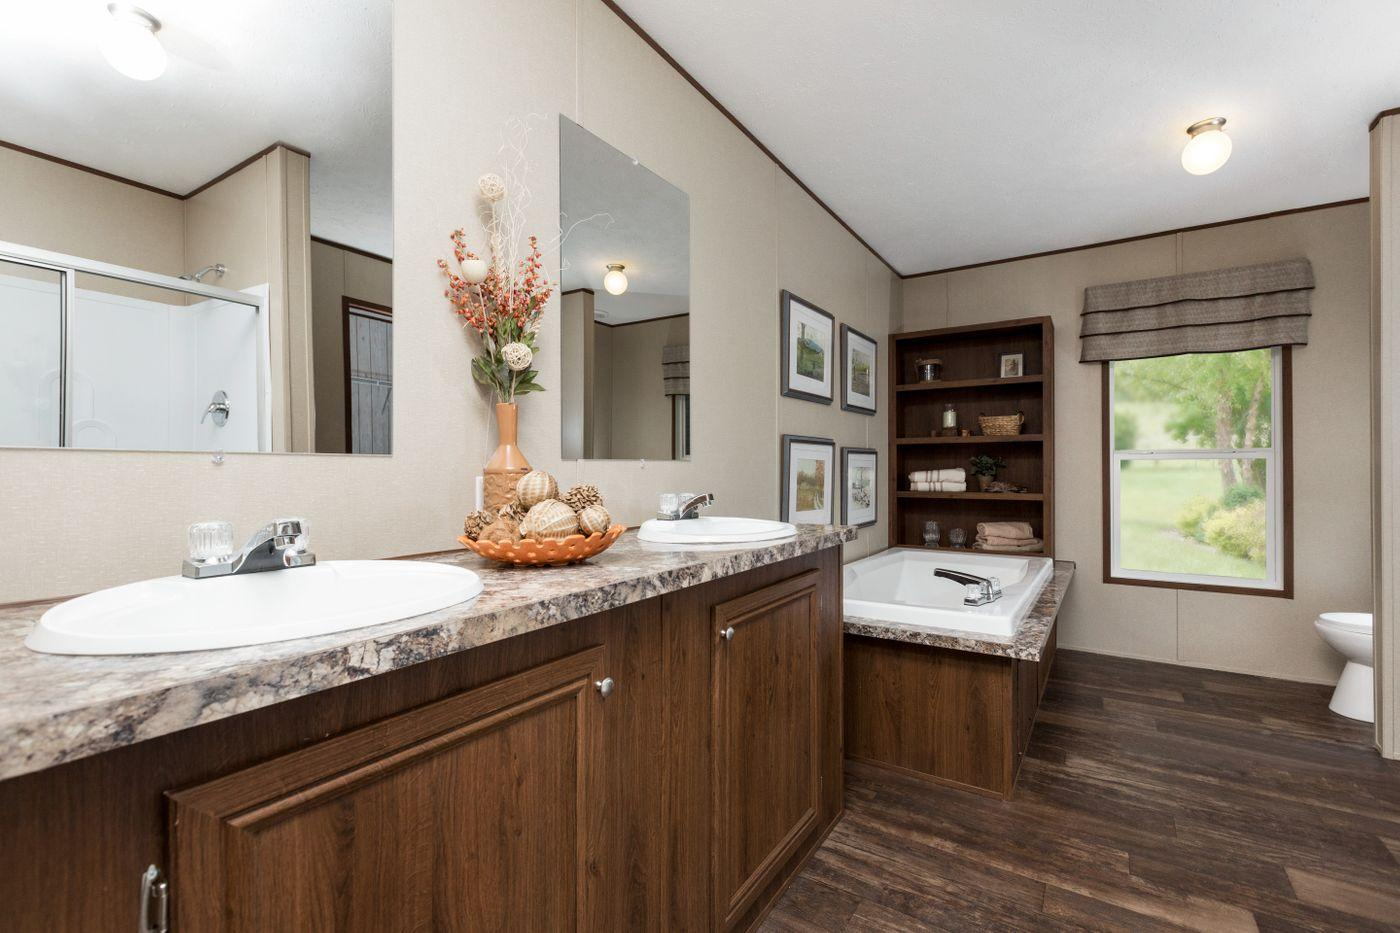 The Bayside Bathroom